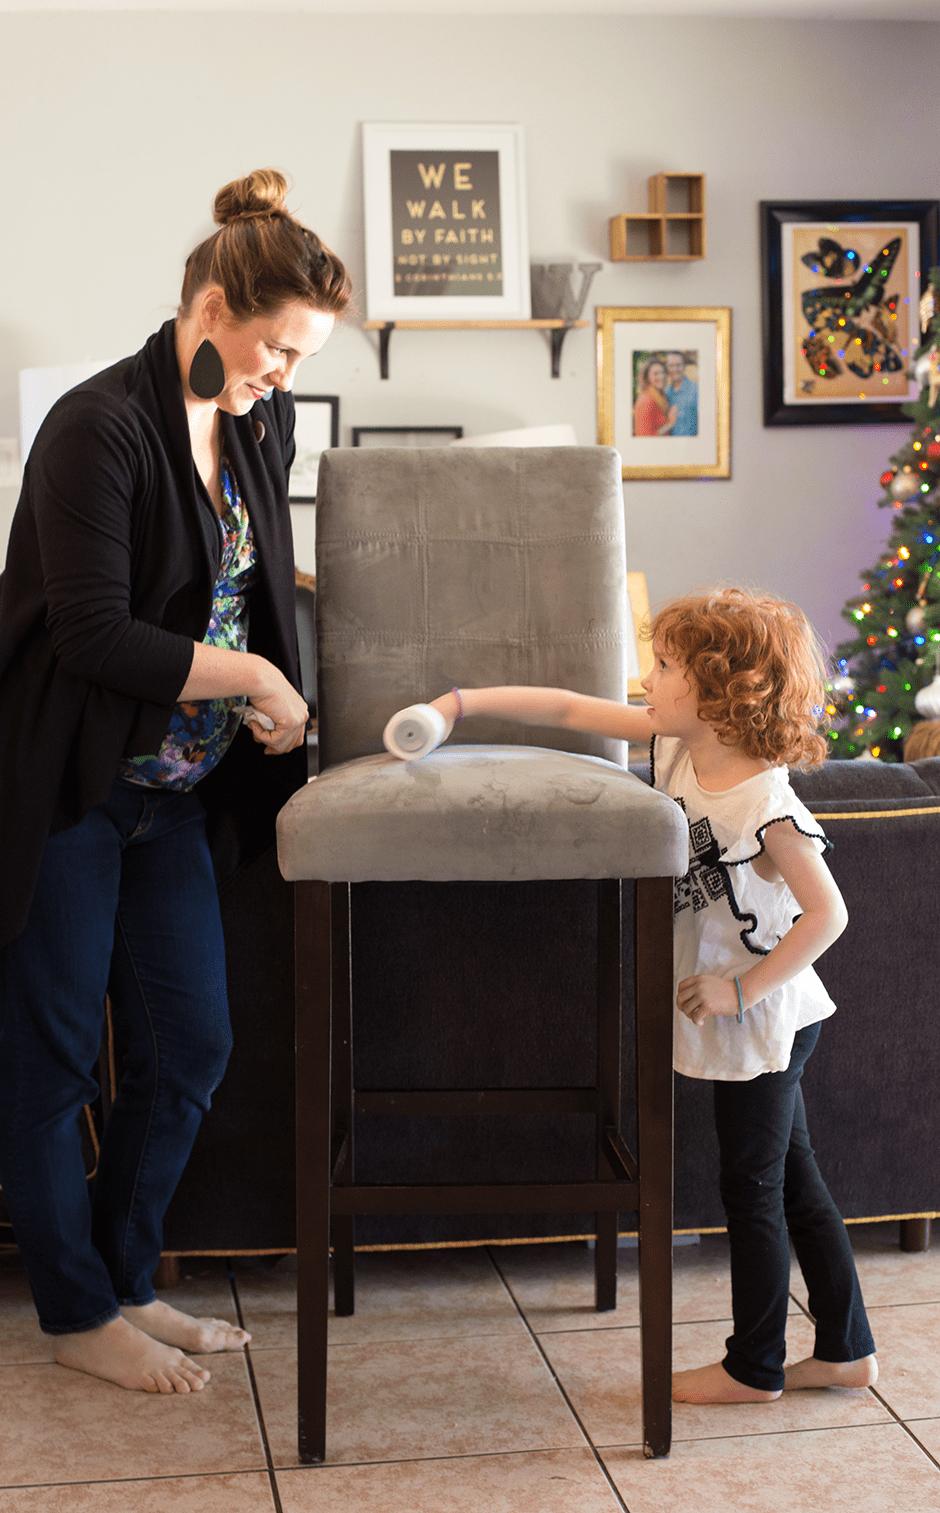 mom helps kid do chores